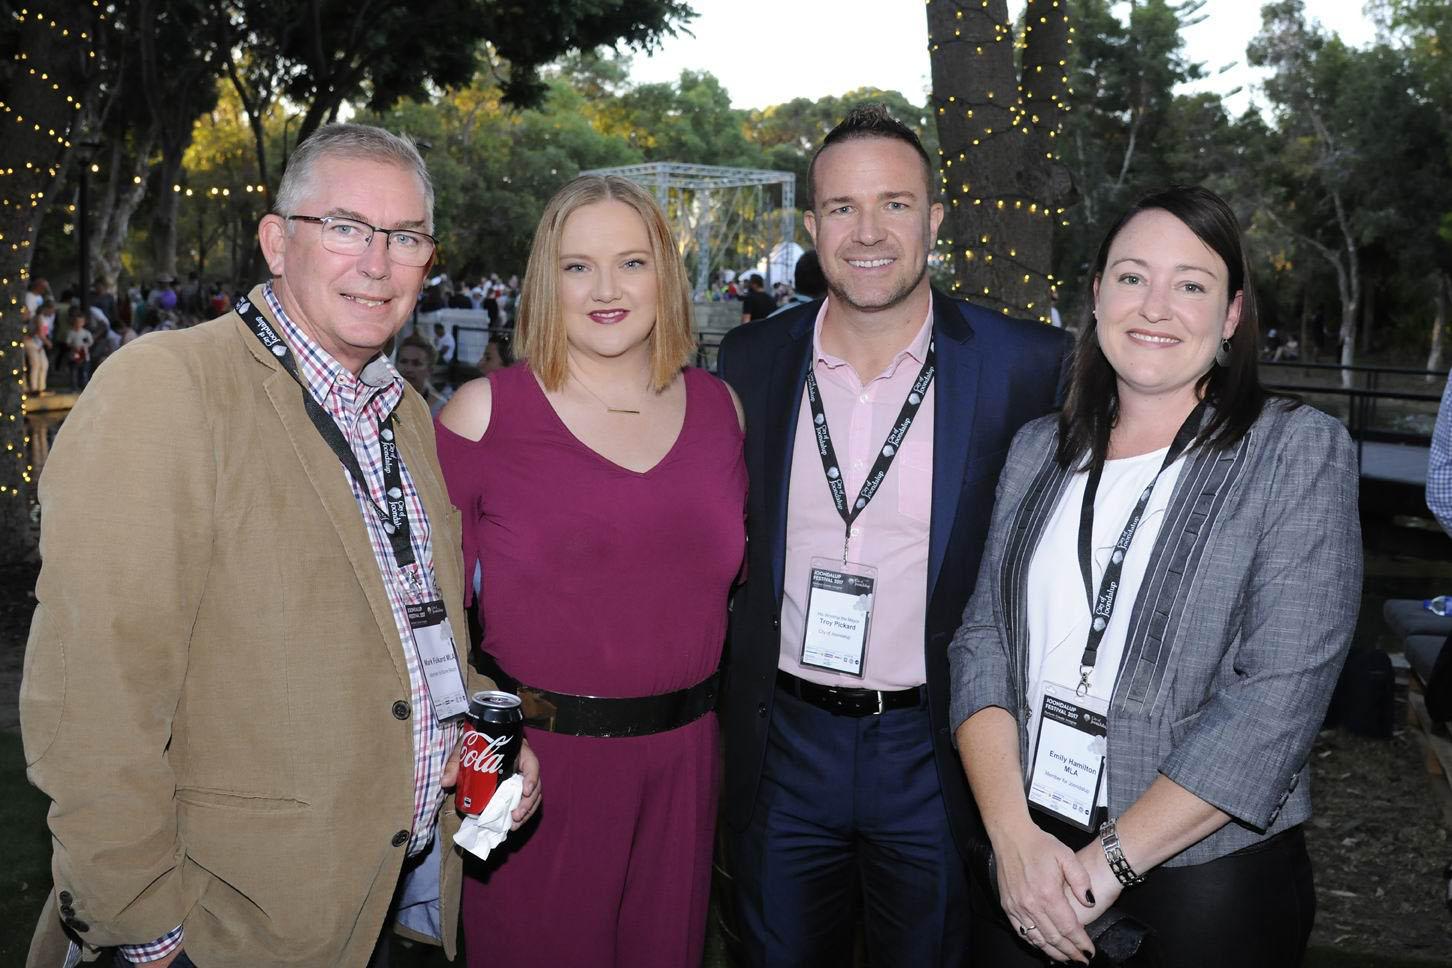 Mayor Troy Pickard with new local members Mark Folkard, Jessica Stojkovski and Emily Hamilton. Pictures: Chris Kershaw